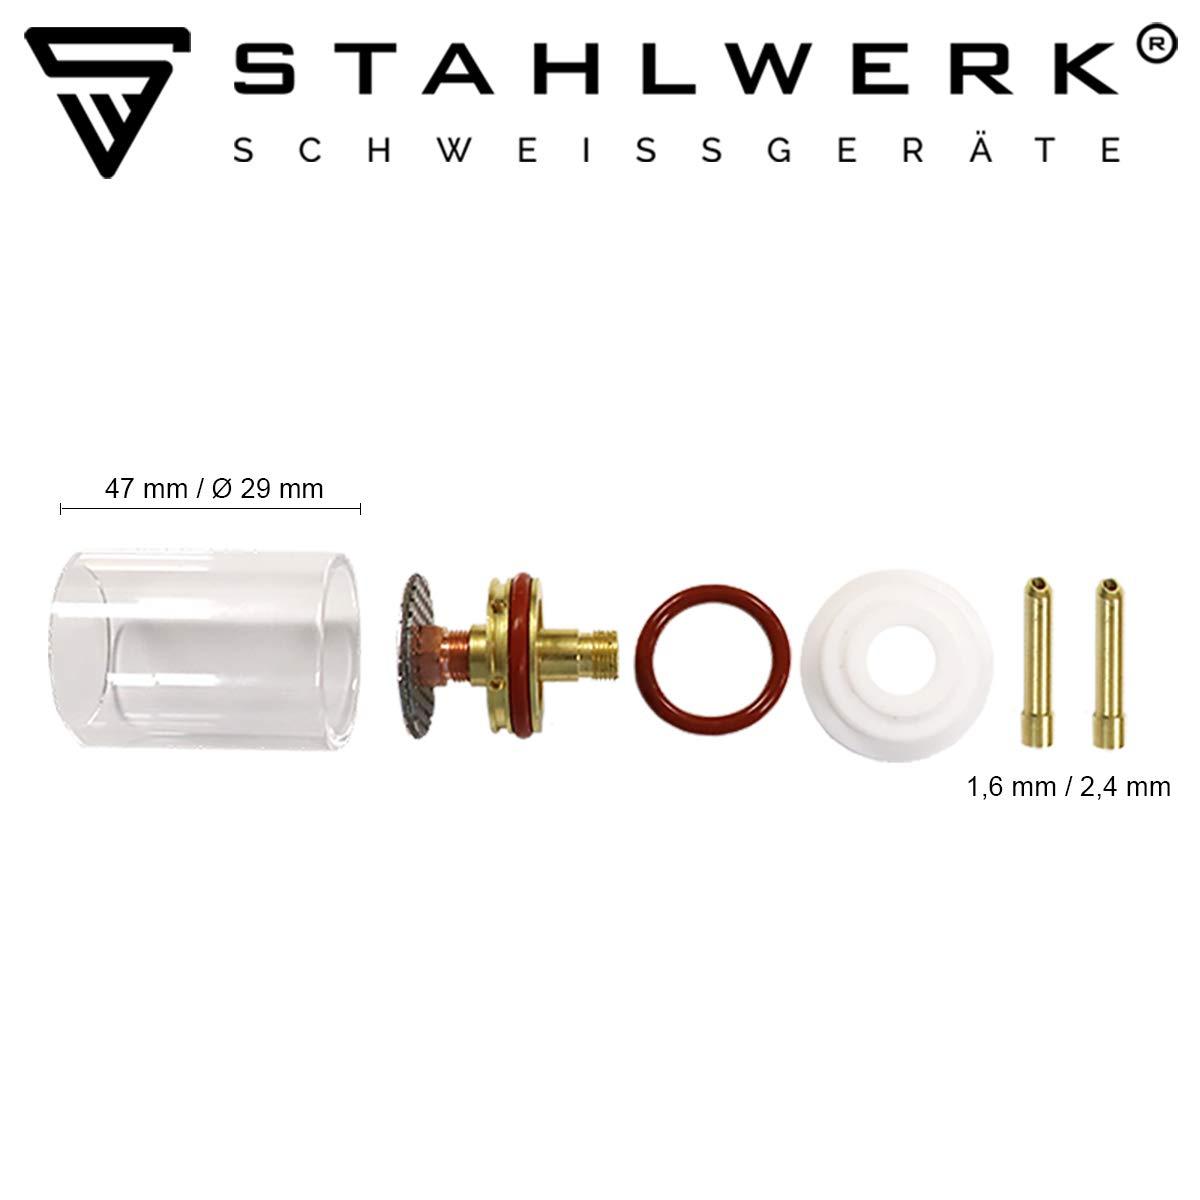 STAHLWERK TIG glas gas lens welding accessories for WP SR Binzel 17 18 26 TIG welding torch 7 pieces